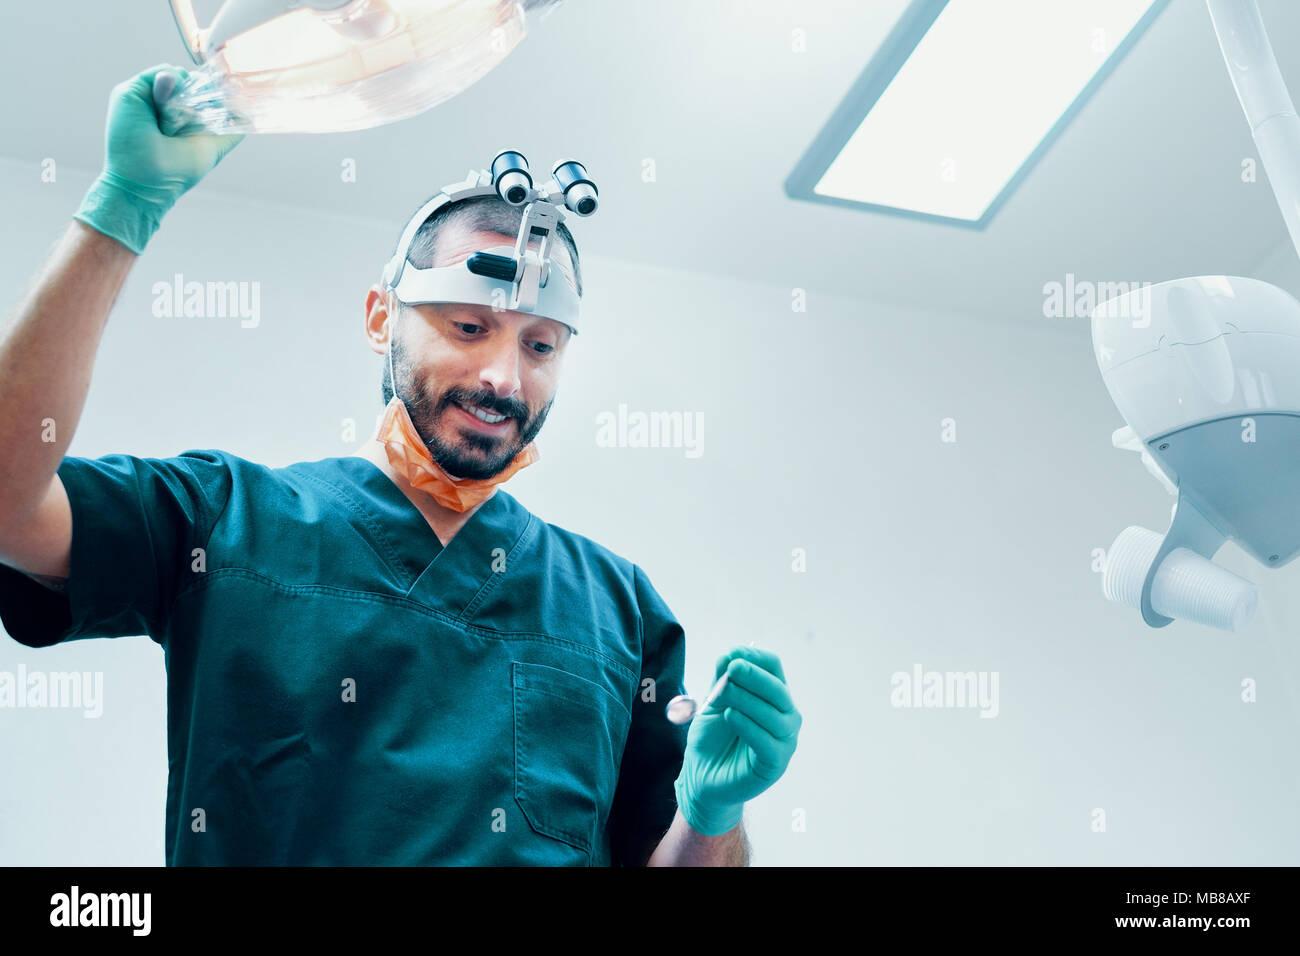 Seguros médicos dentista masculino con equipos de cirugía Foto de stock